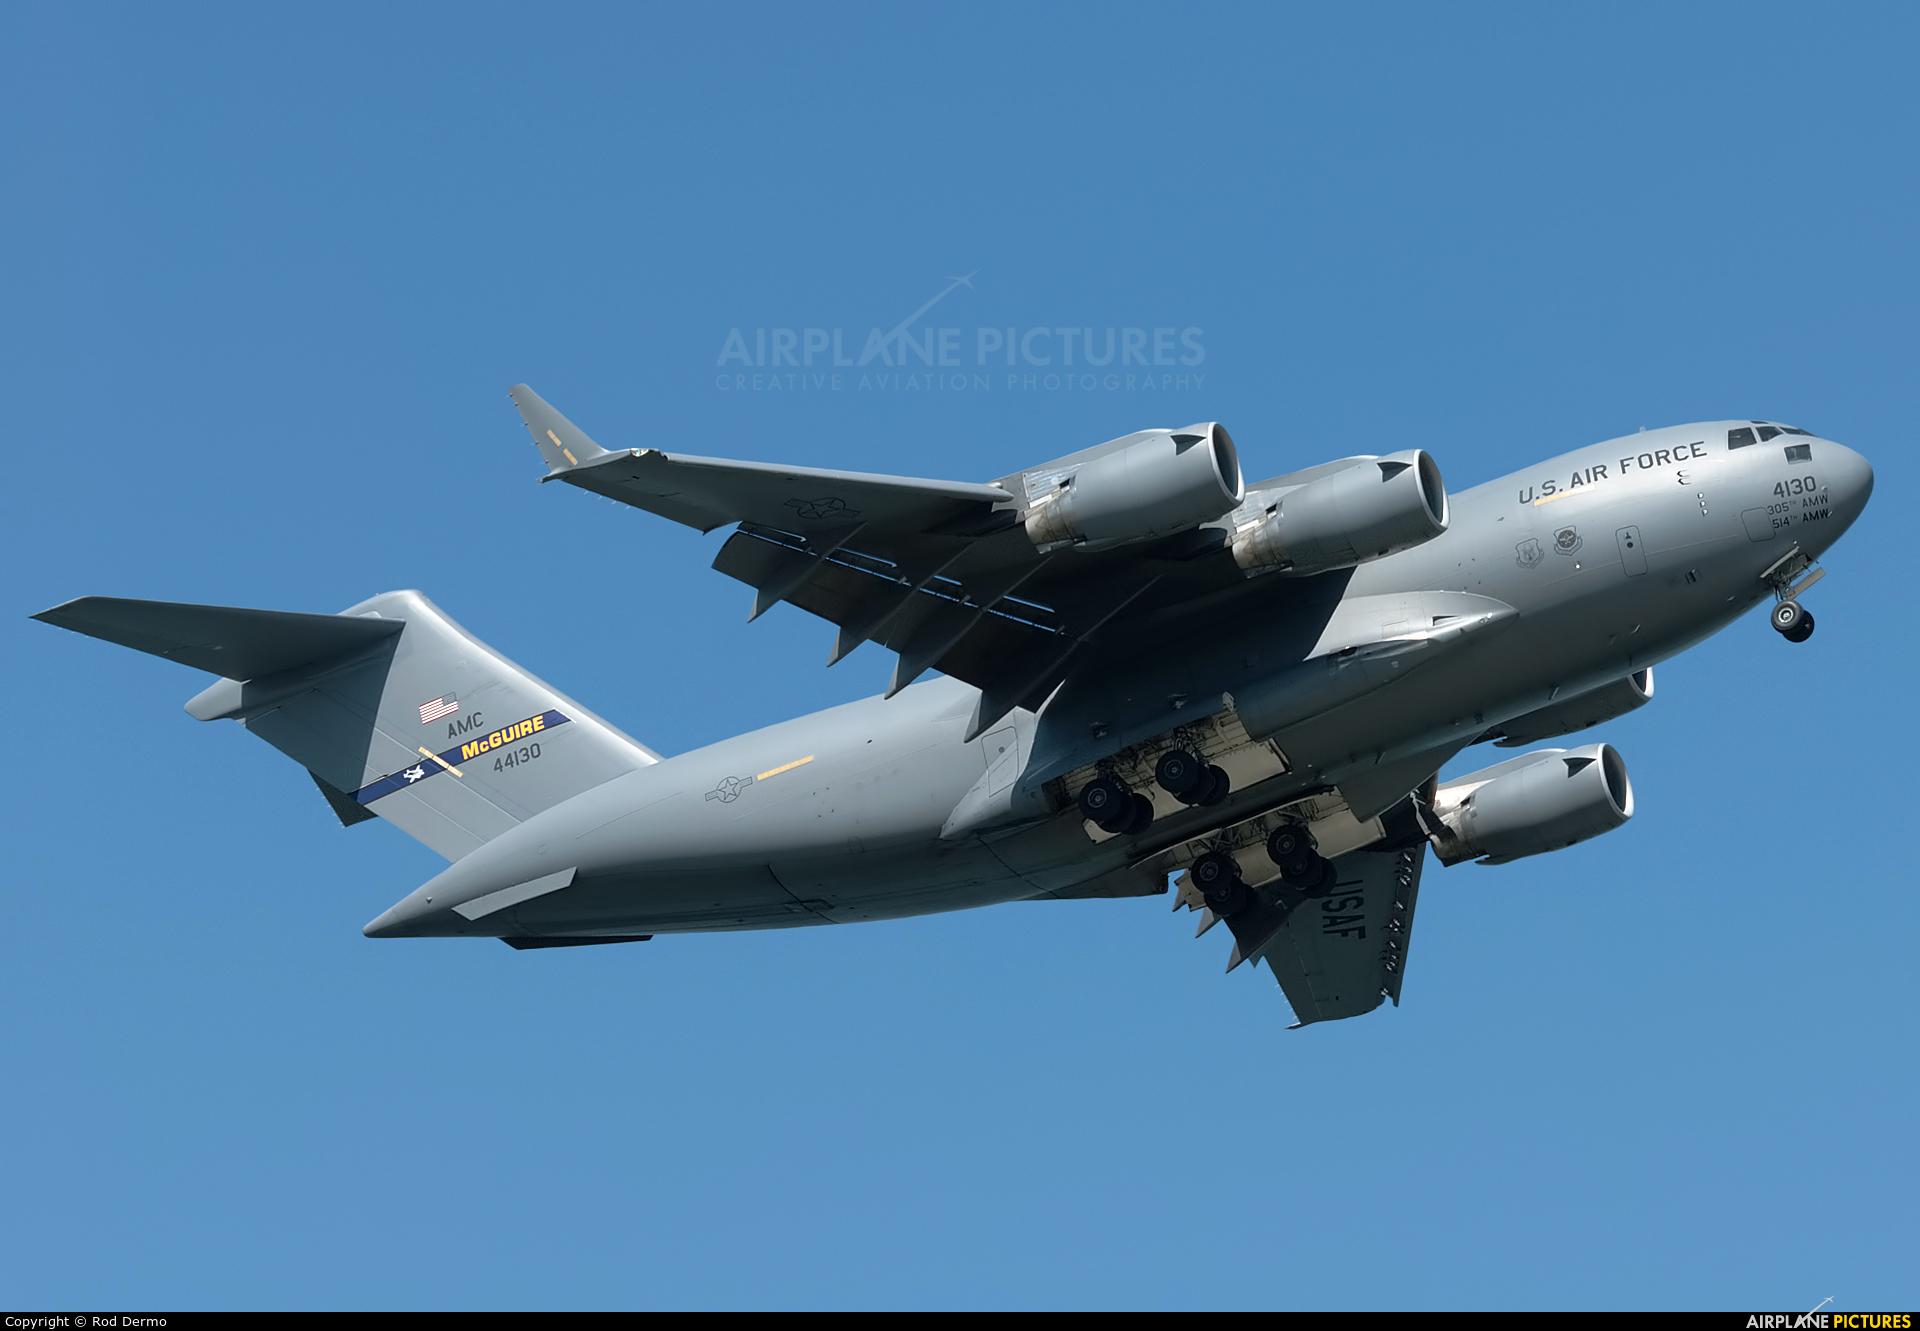 USA - Air Force 04-4130 aircraft at Cleveland - Burke Lakefront